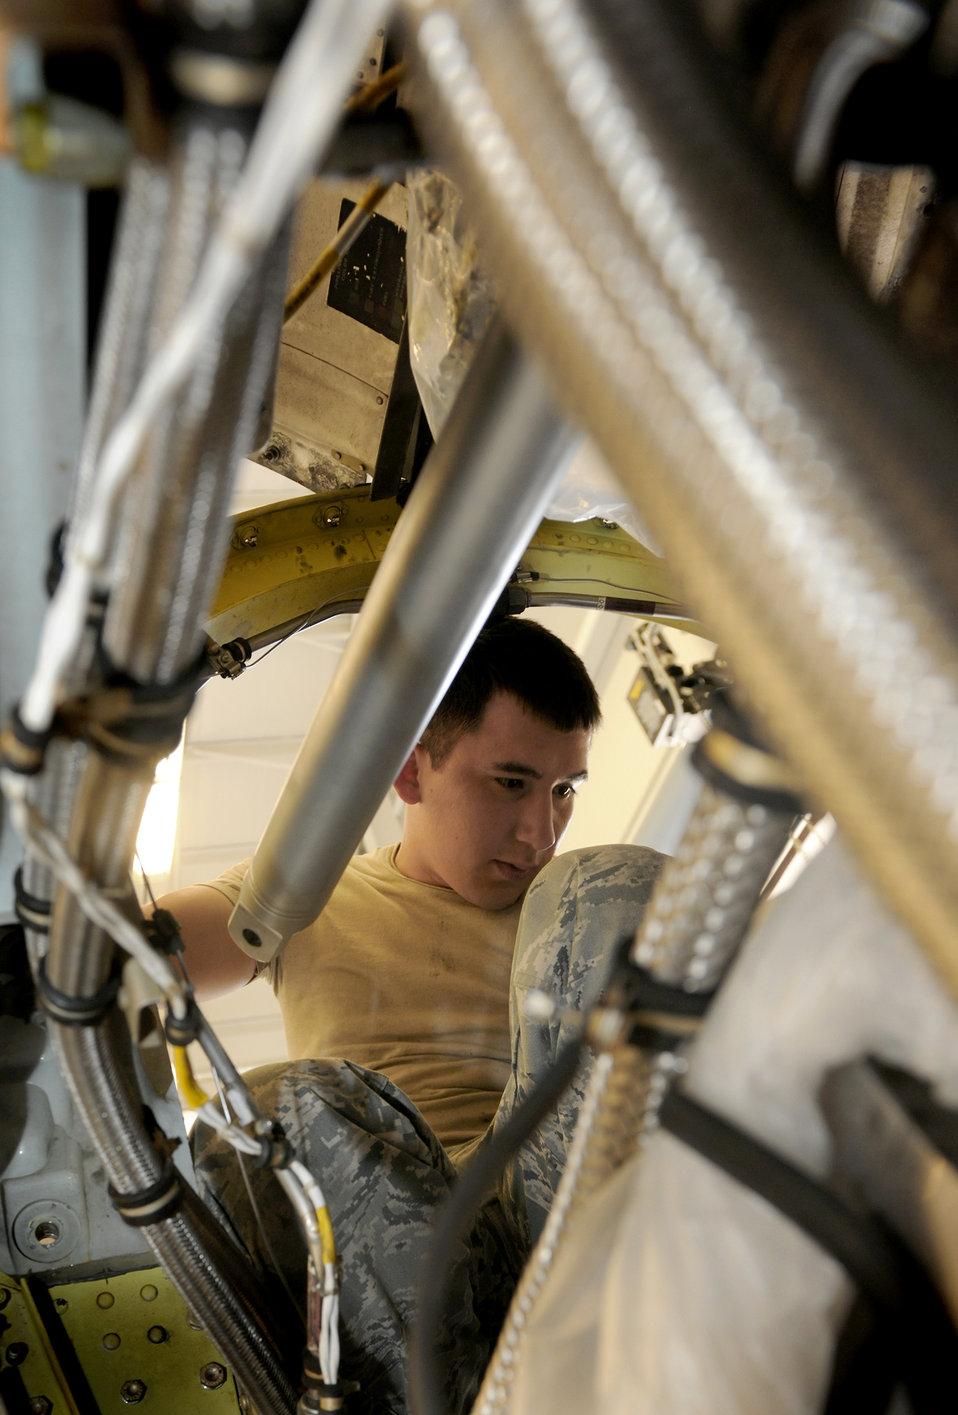 Engine mechanics cross train